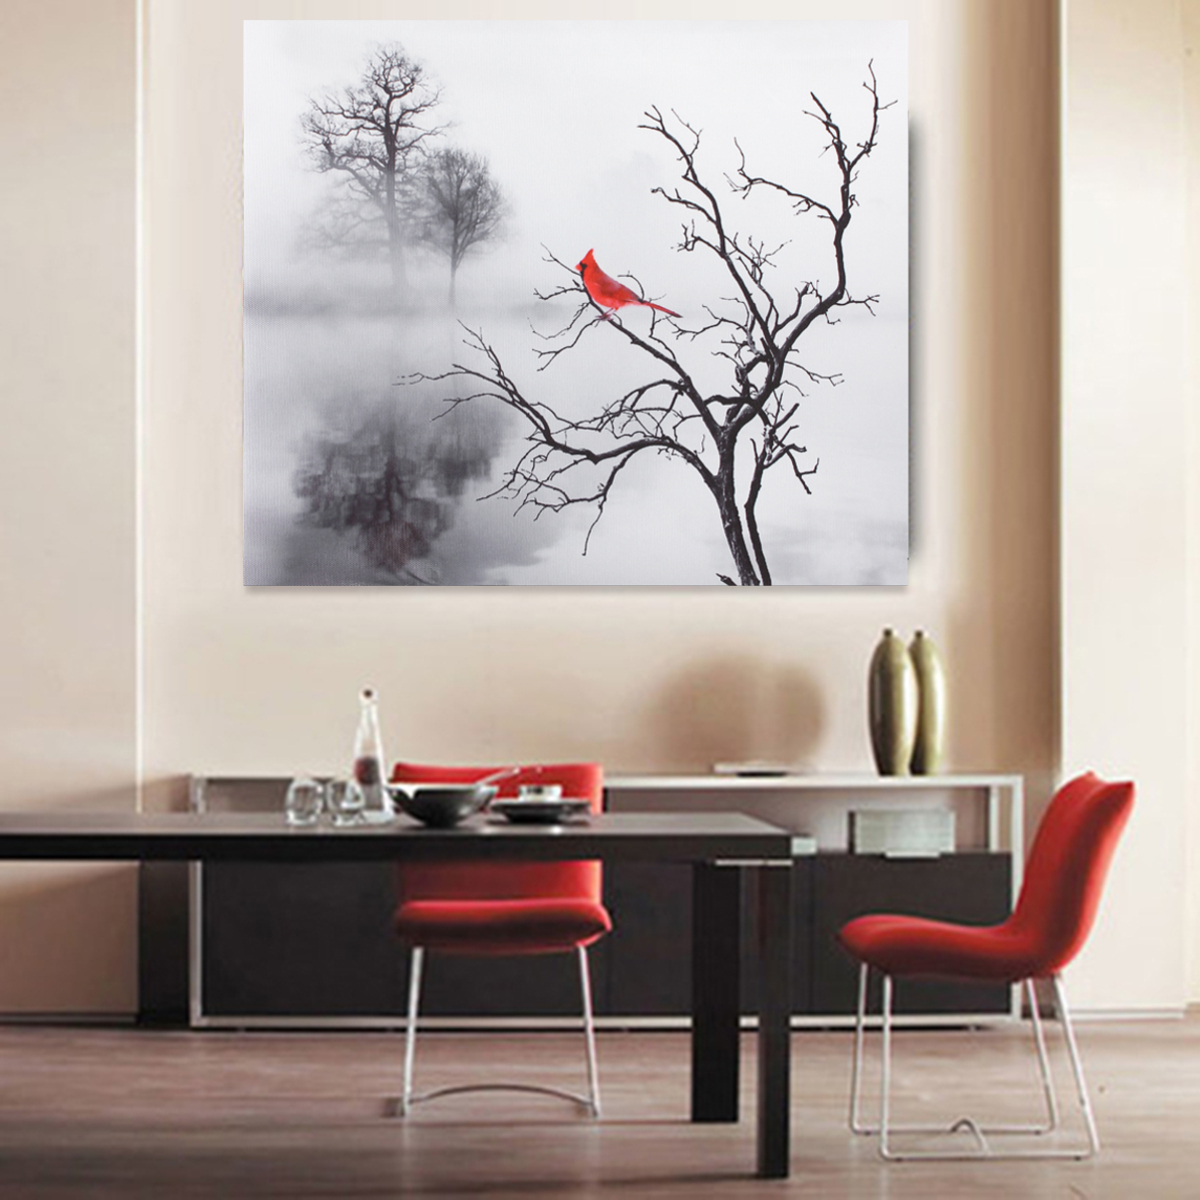 Red Cardinal Bird Home Decor Wall Art Photo Print Bw Home Decorators Catalog Best Ideas of Home Decor and Design [homedecoratorscatalog.us]